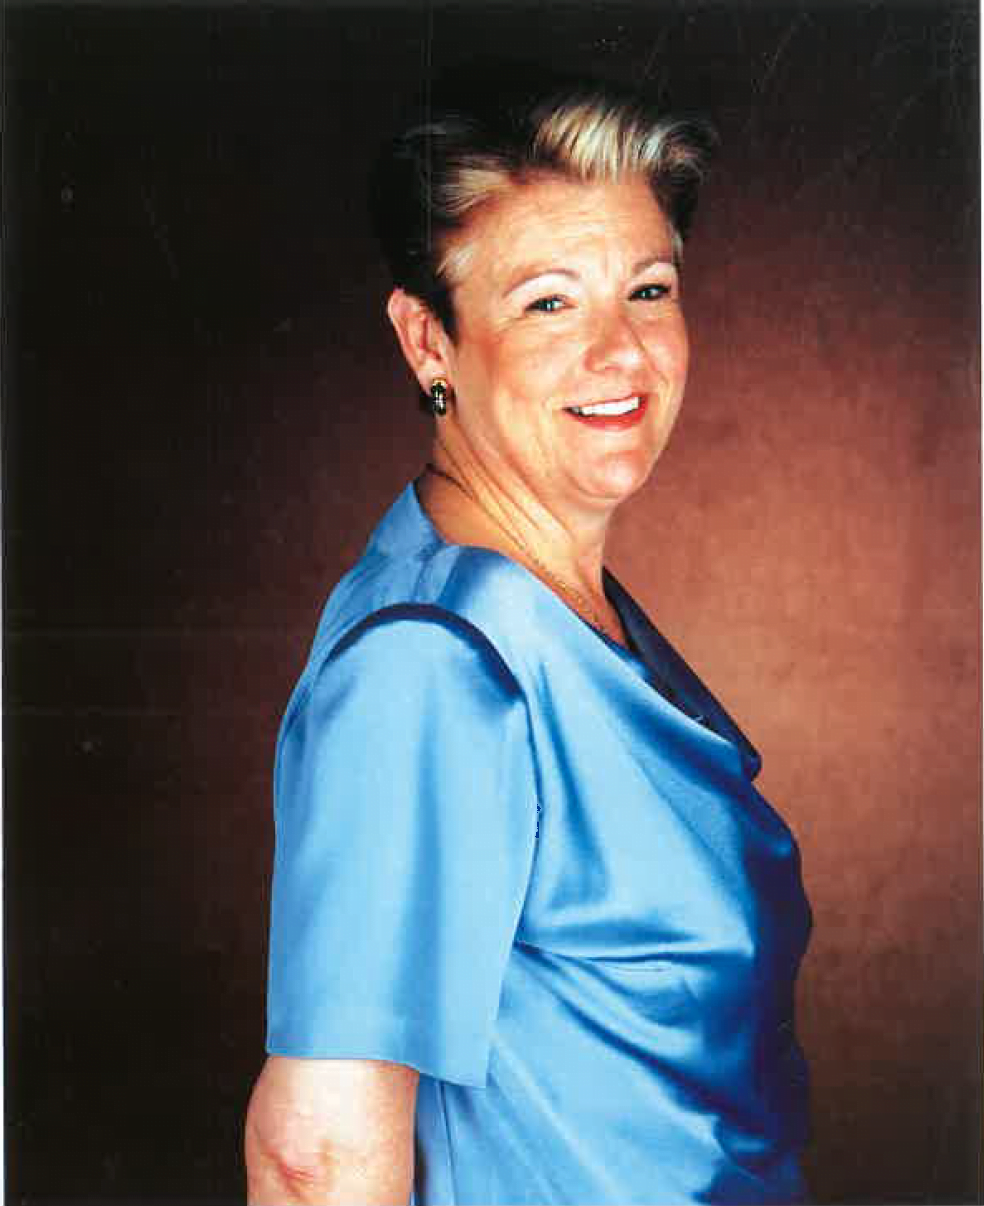 María Eugenia Prades Albalate